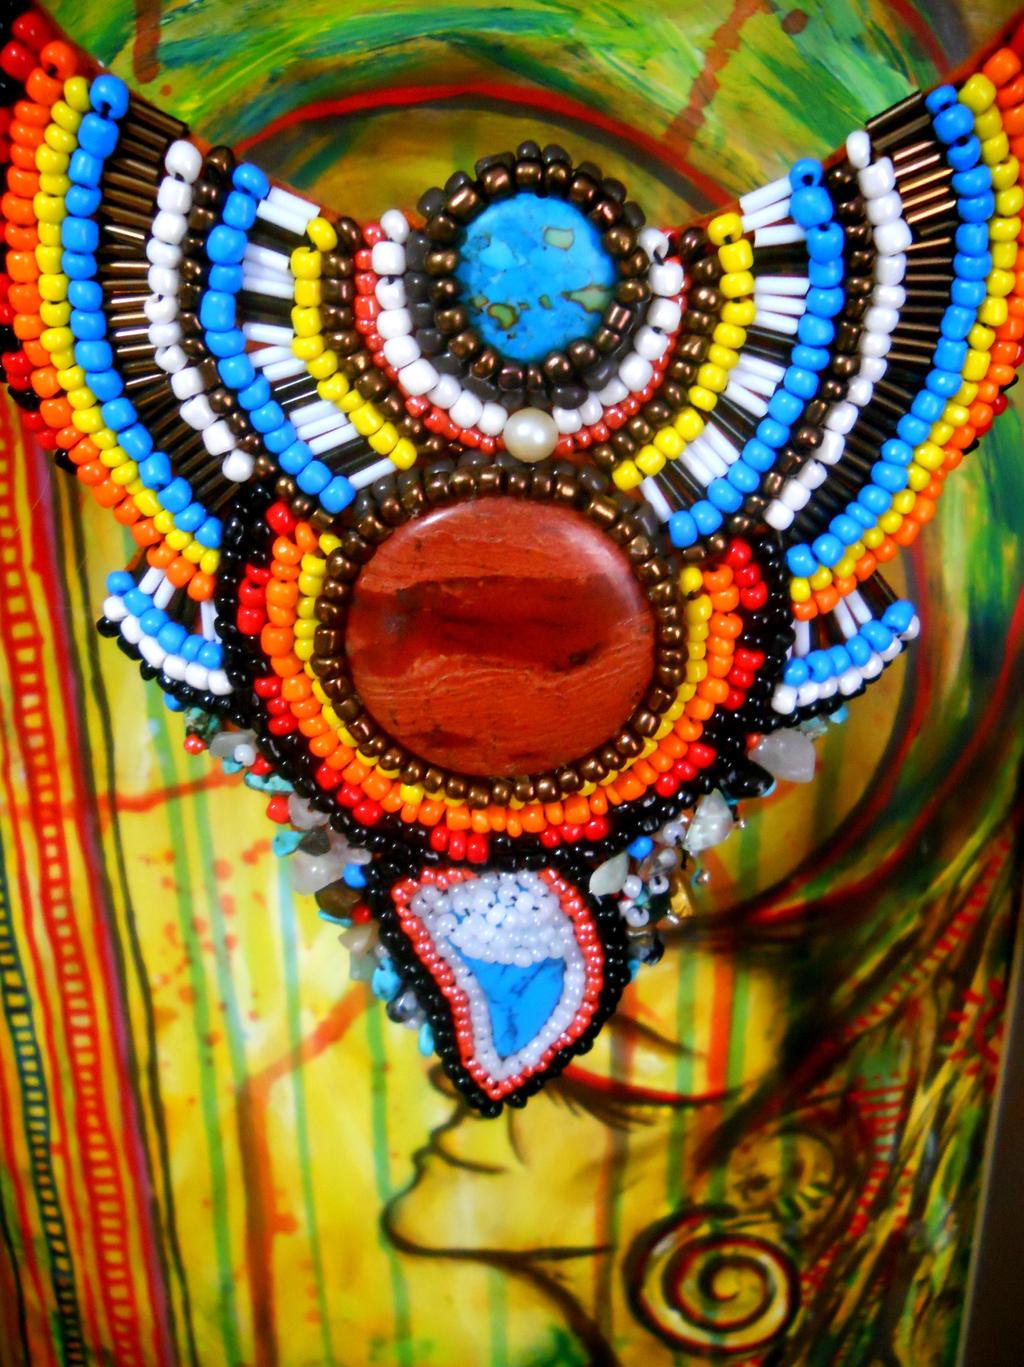 native american colors anidandelion